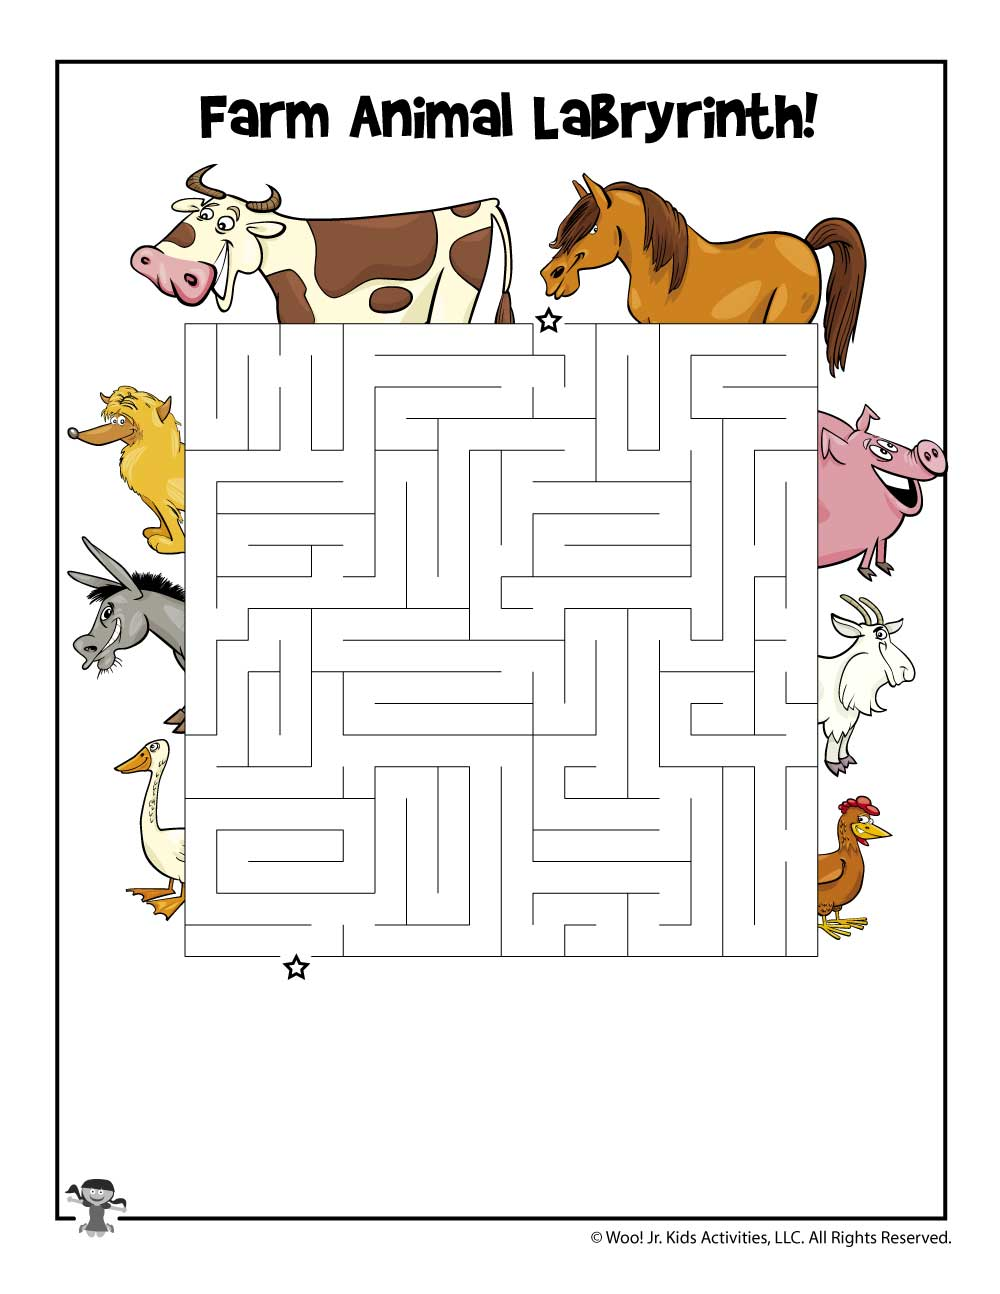 Farm Animal Printable Maze Woo Jr Kids Activities